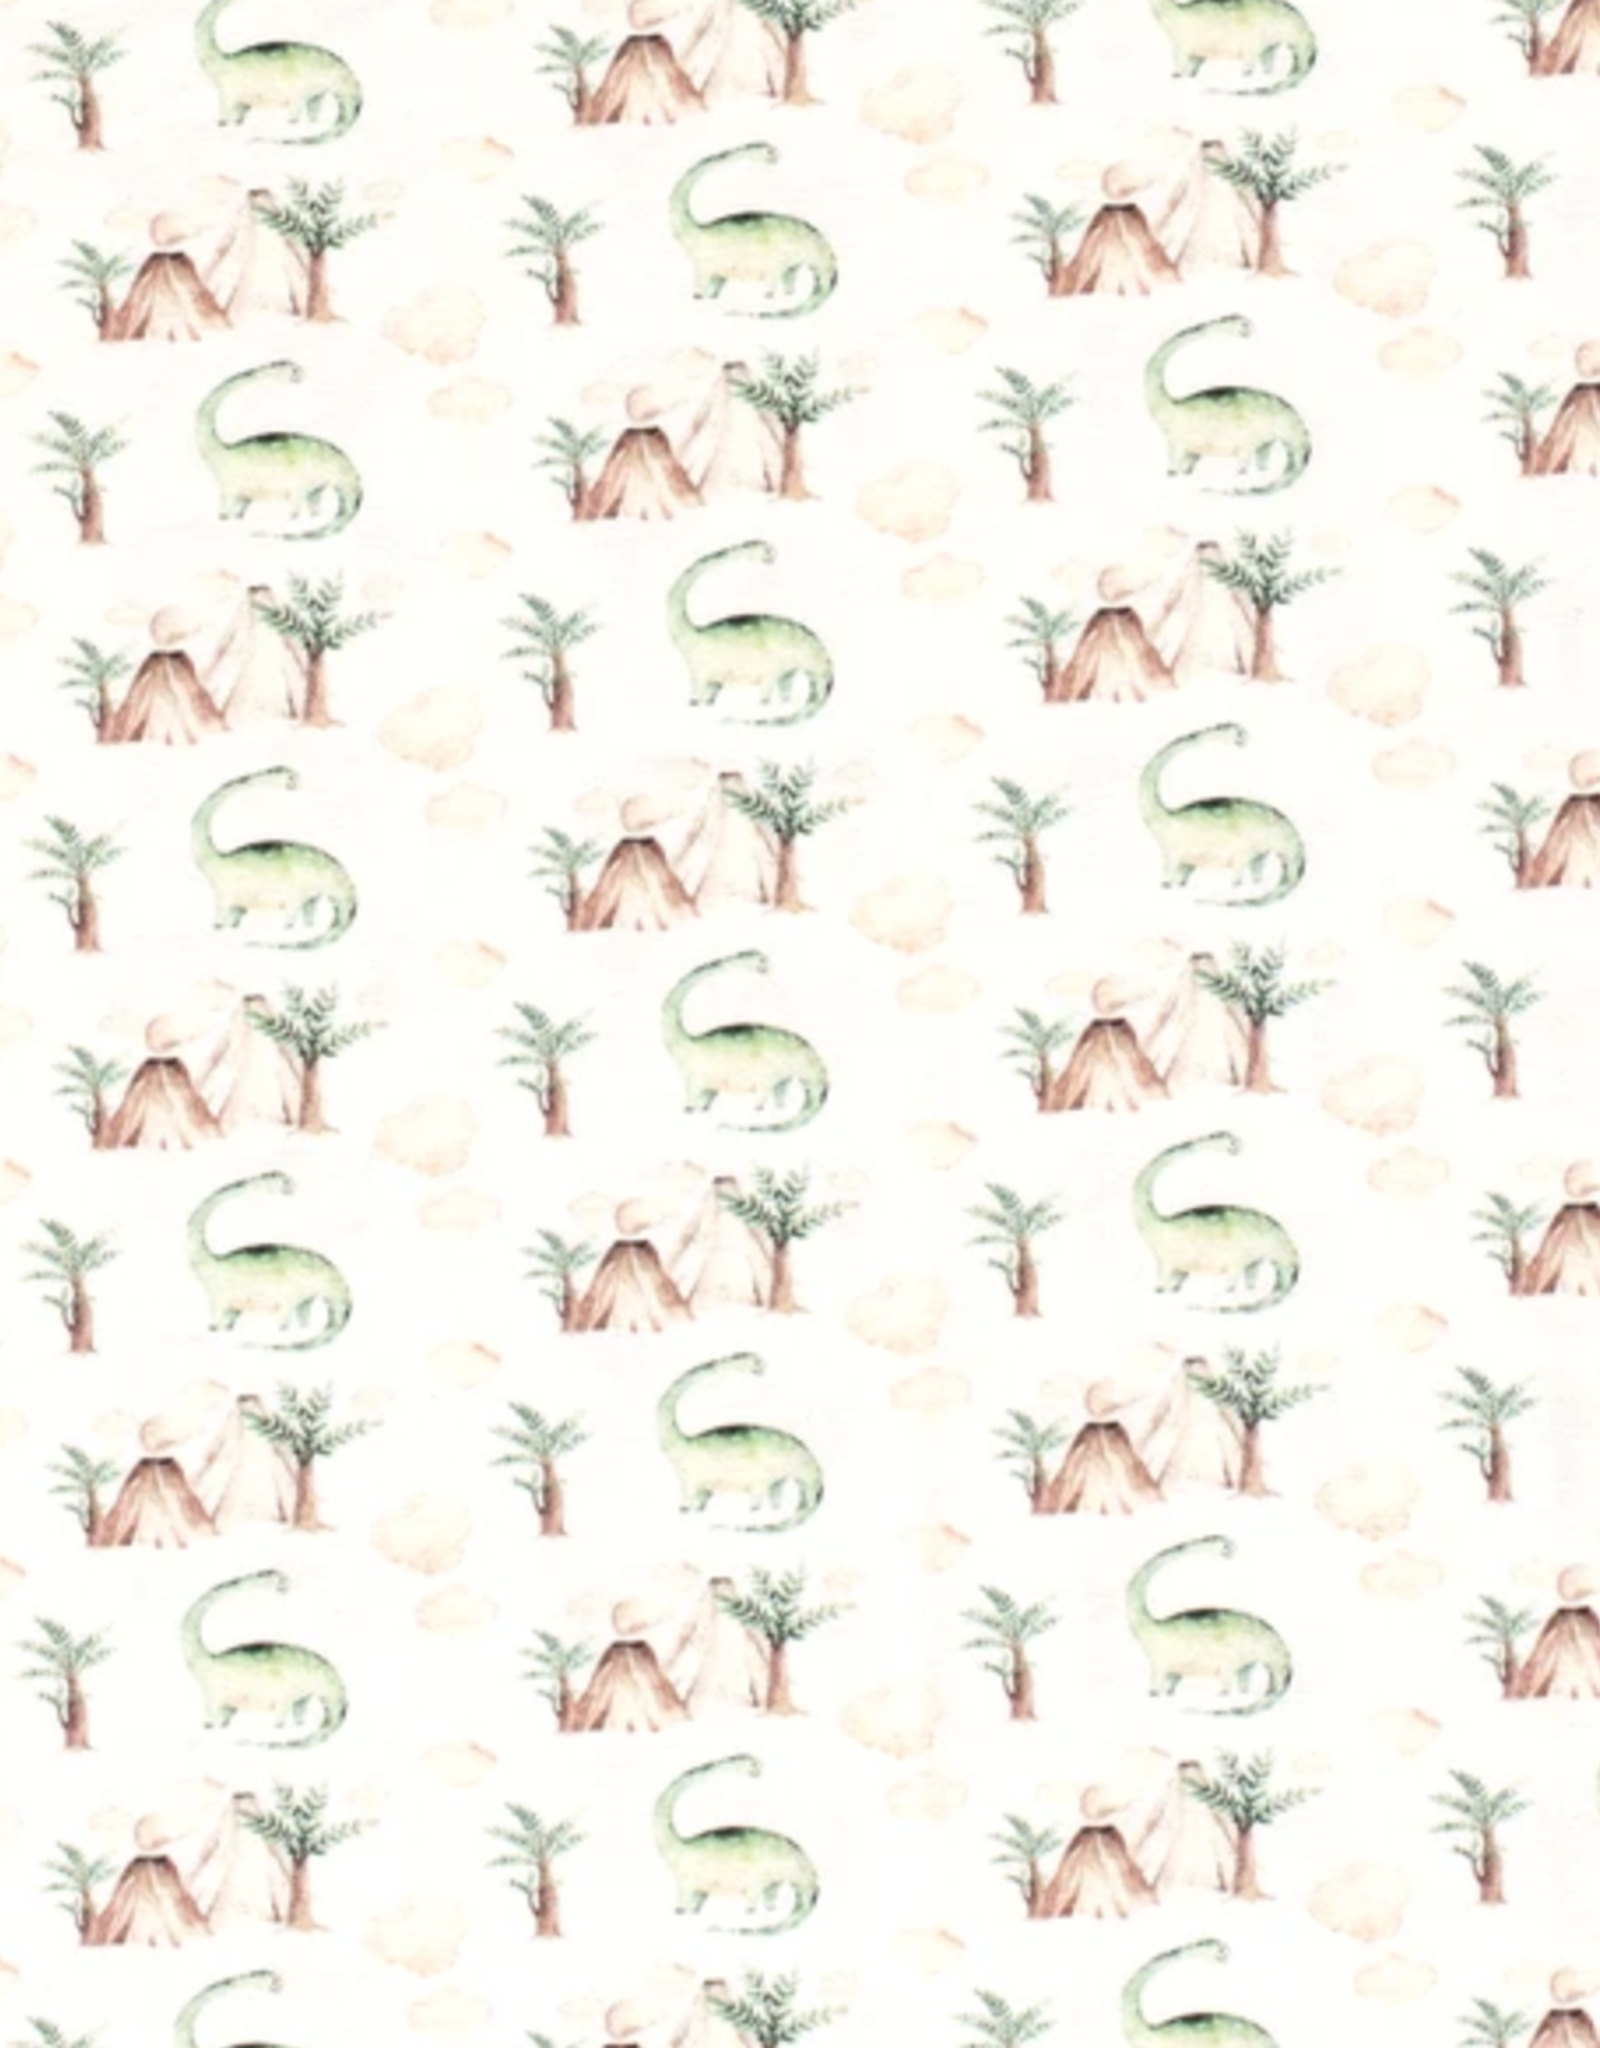 Tricot - Digi Dino